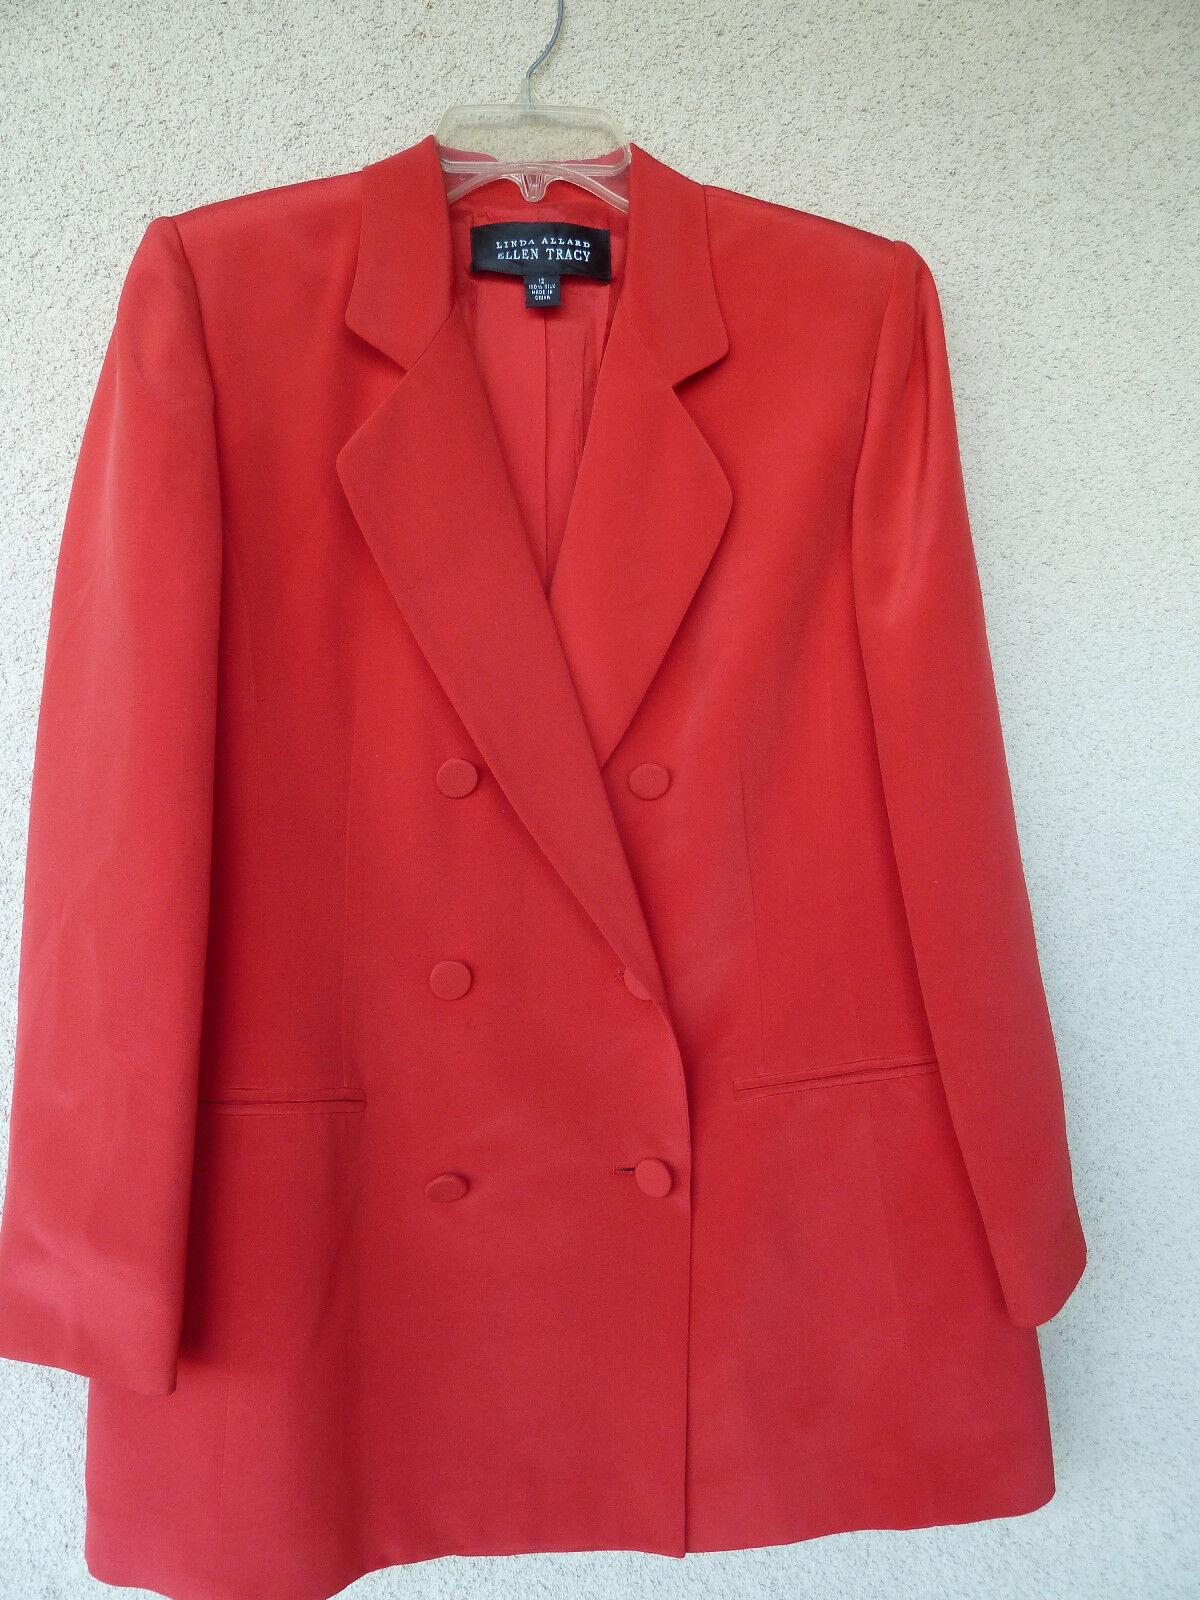 Ellen Tracy Fire Engine Red Silk Silk Silk Pant Suit  12 8 a16b2c